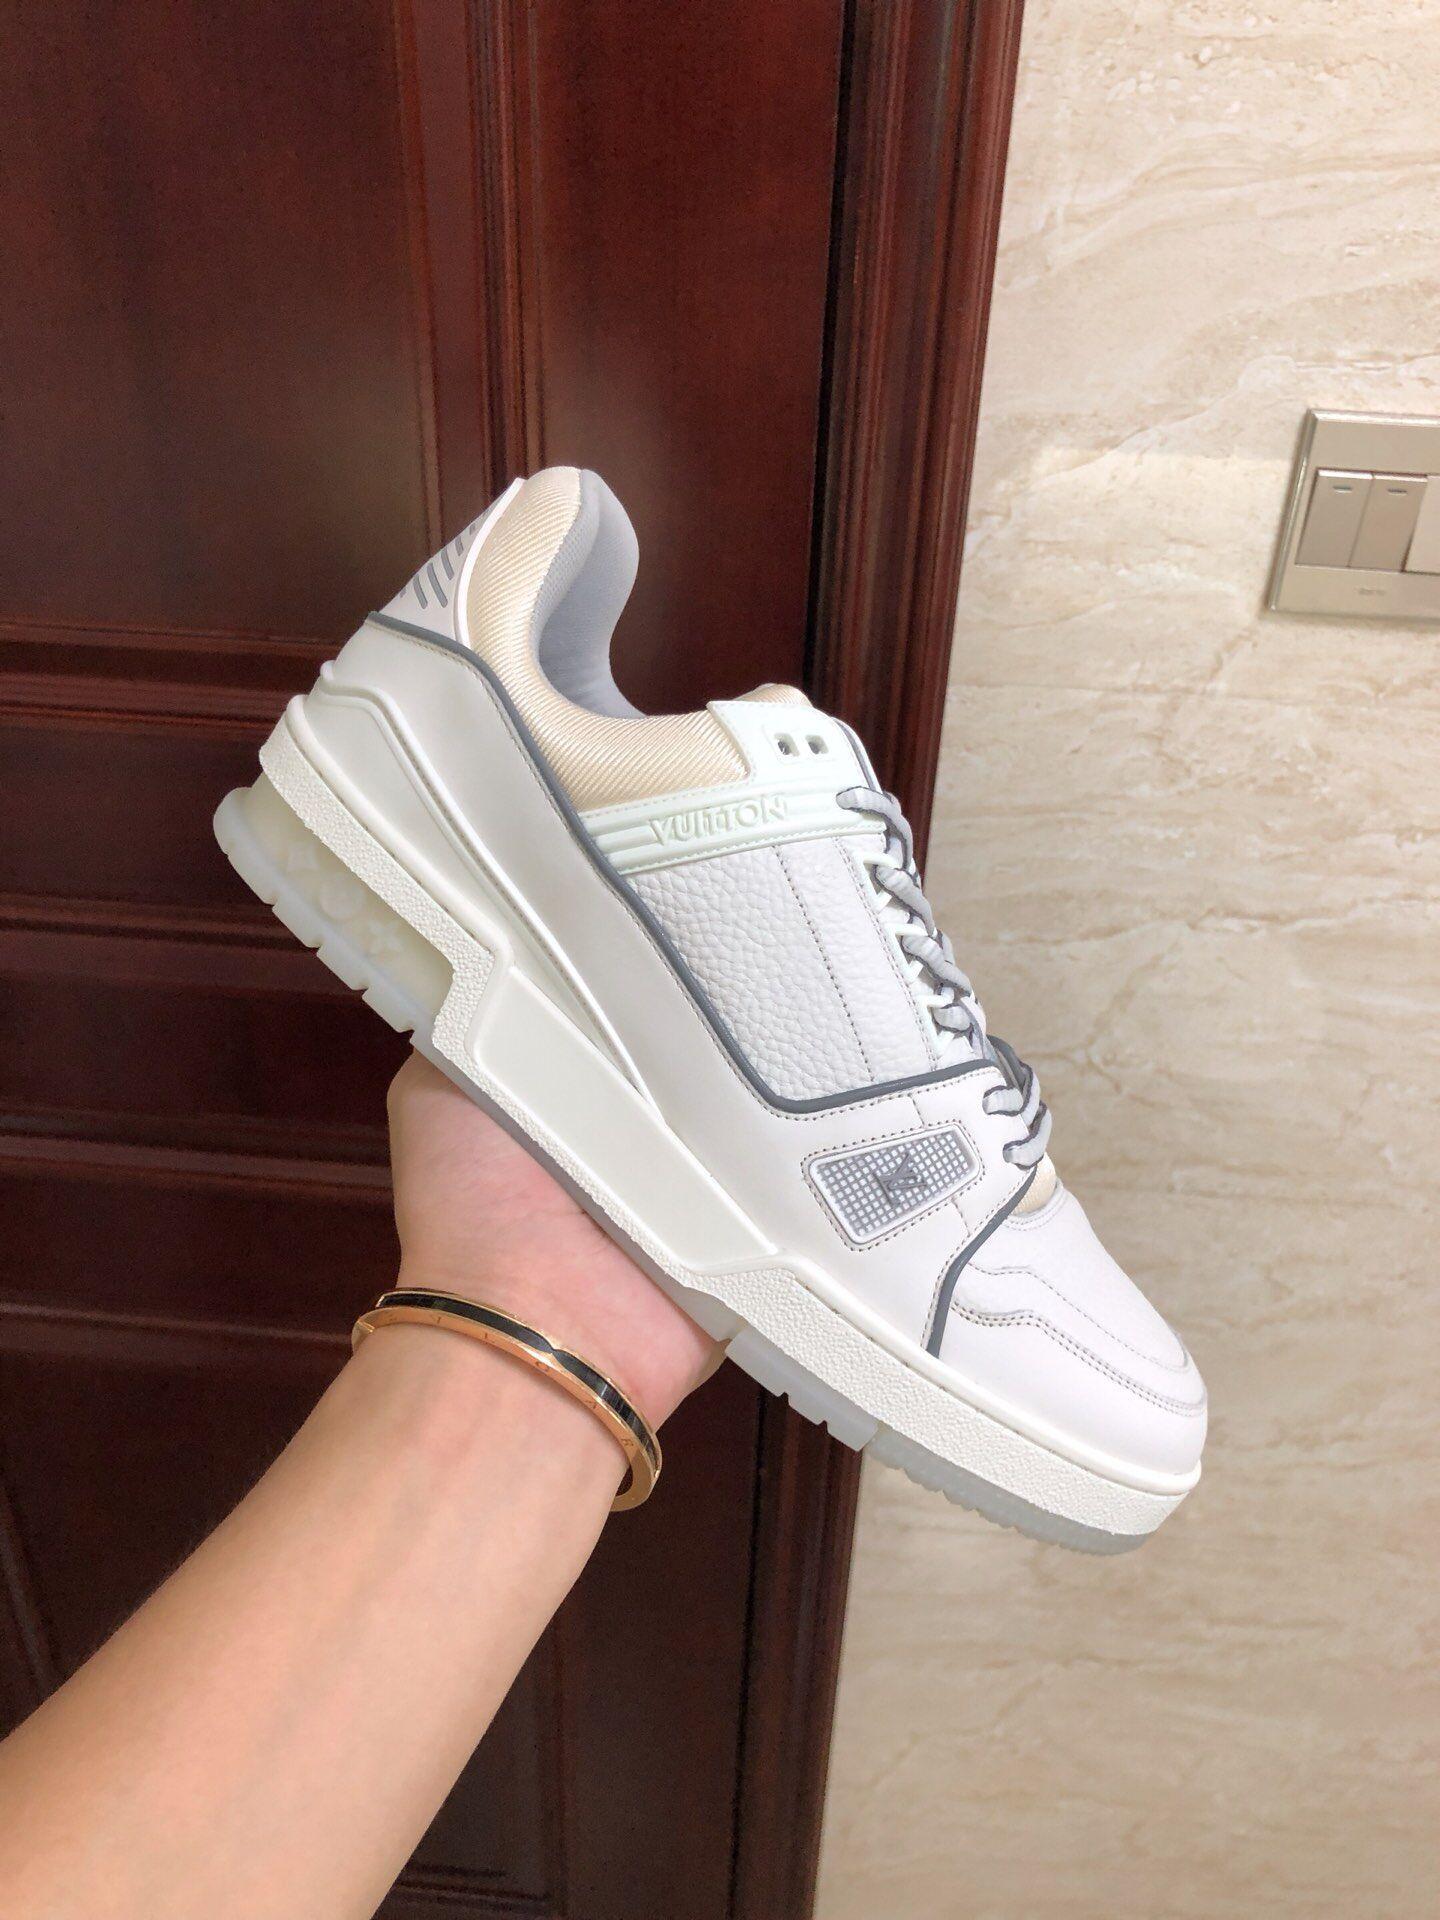 lv trainer sneaker Grained calf leather white lv sneaker 1A5PZO lv sneaker lv  1